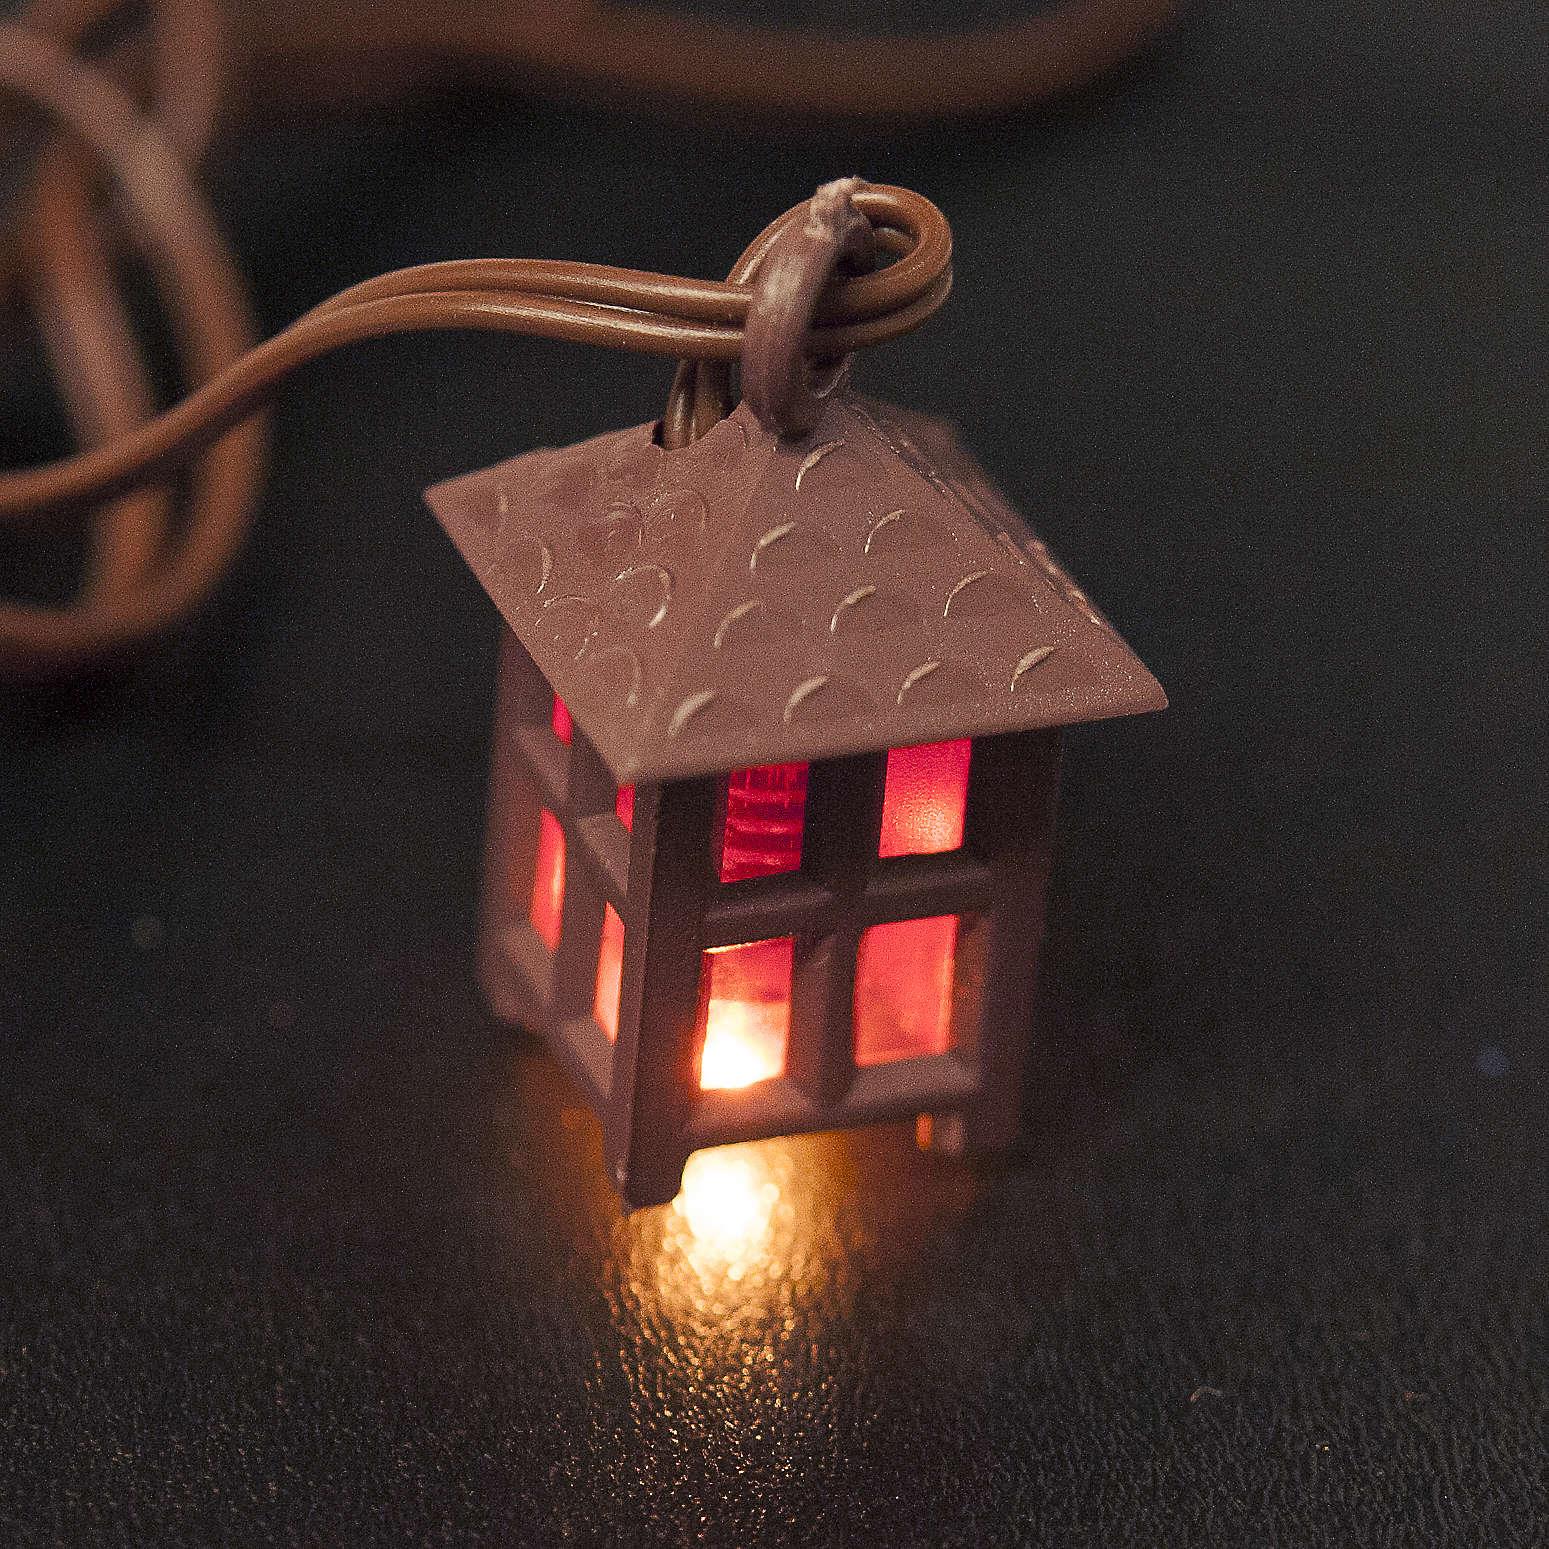 Lanterna plástico luz vermelha h 2,5 cm 4